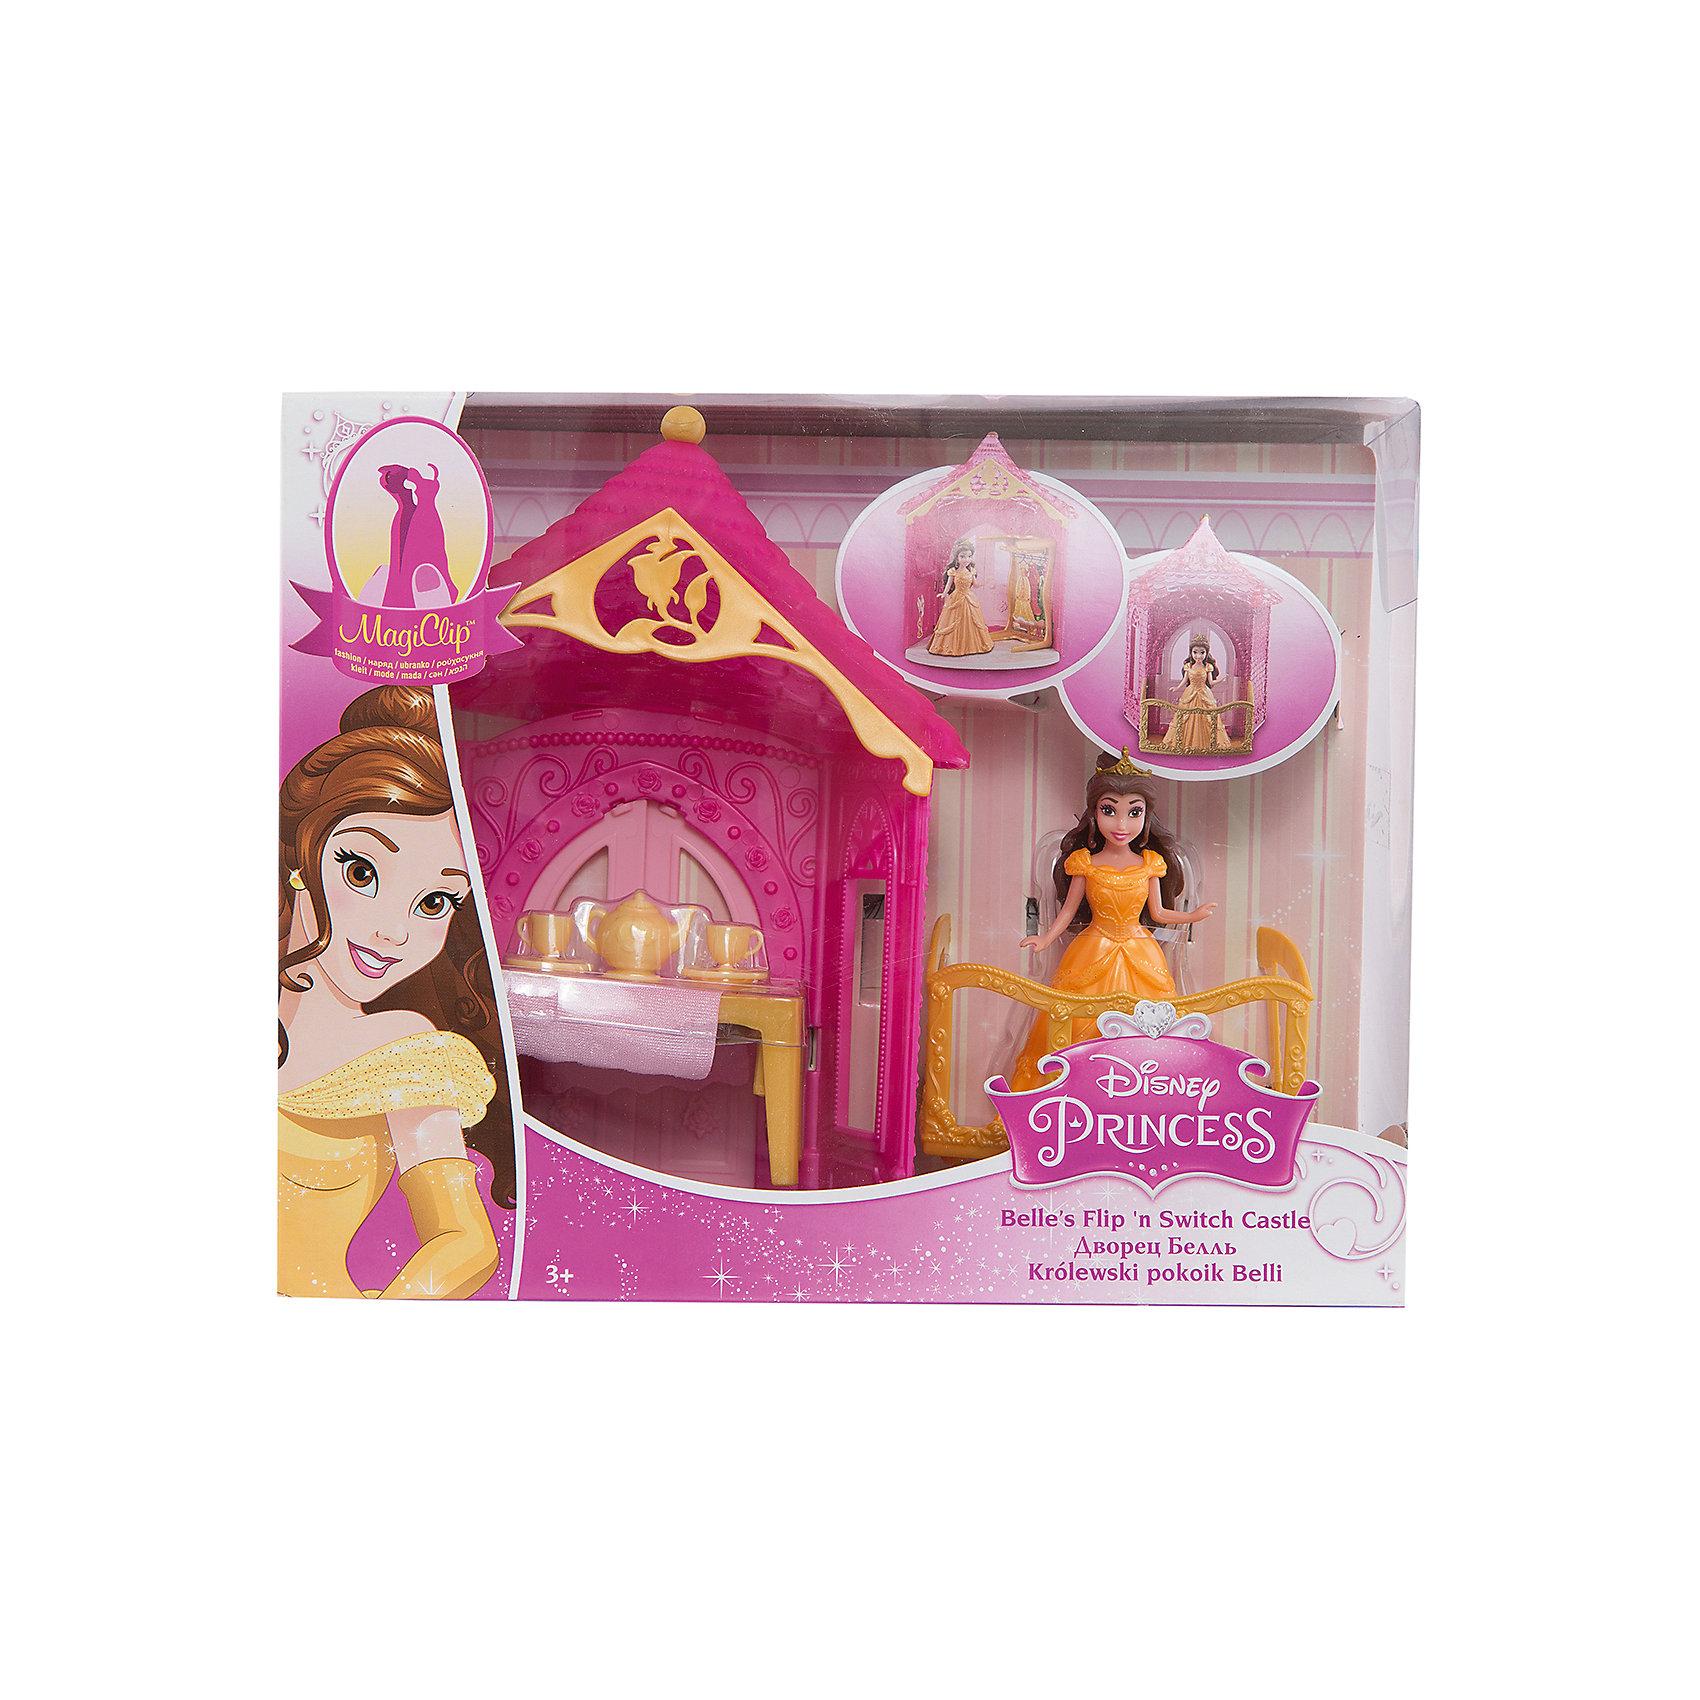 Набор Комната принцессы Бэлль, с куклой и аксессуарами, Disney PrincessМини-куклы<br><br><br>Ширина мм: 205<br>Глубина мм: 80<br>Высота мм: 250<br>Вес г: 398<br>Возраст от месяцев: 36<br>Возраст до месяцев: 144<br>Пол: Женский<br>Возраст: Детский<br>SKU: 4739607